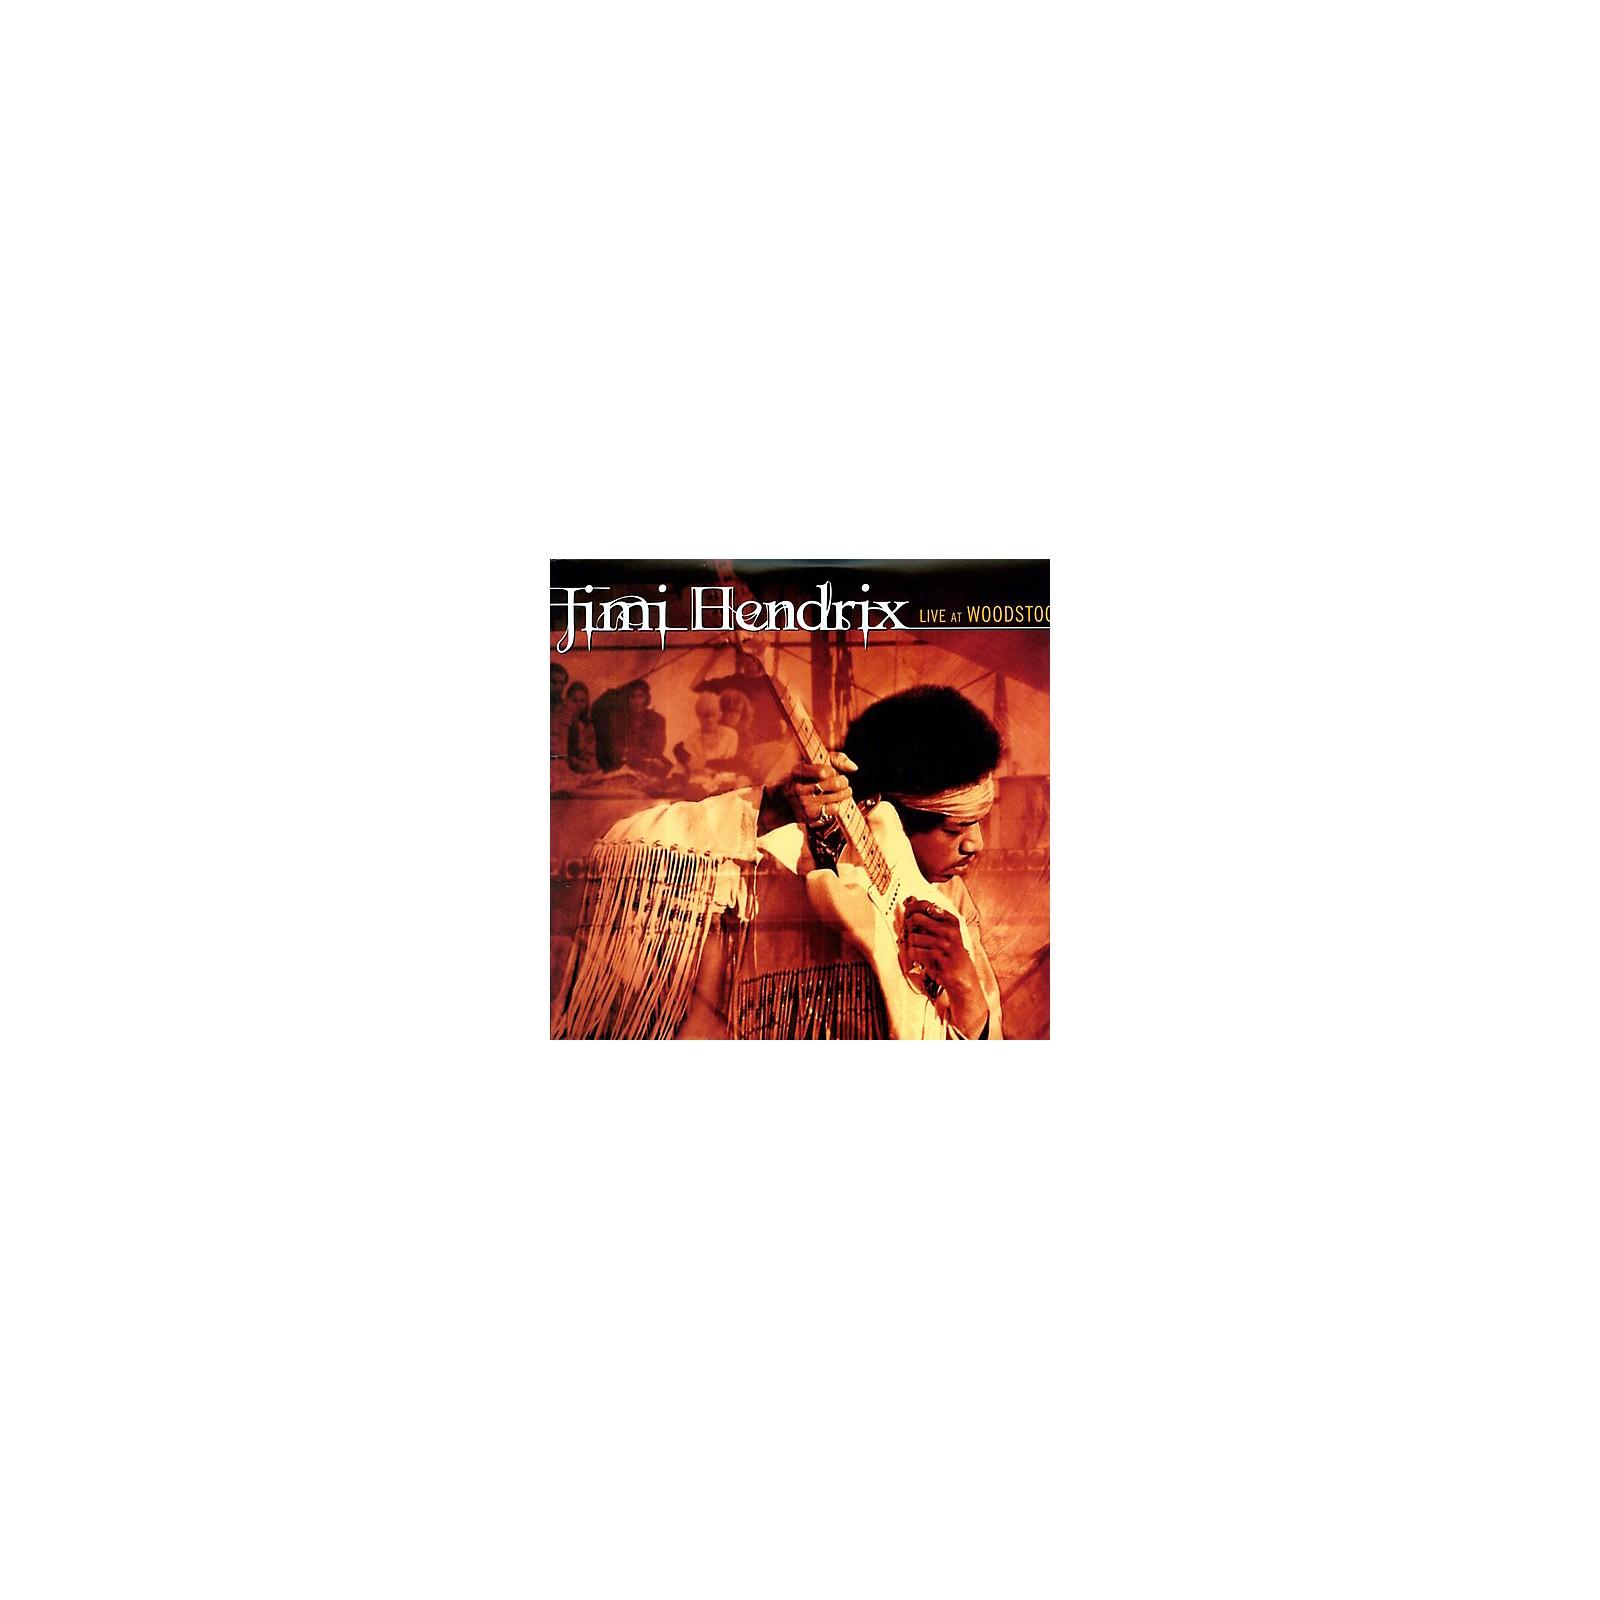 Alliance Jimi Hendrix - Live at Woodstock